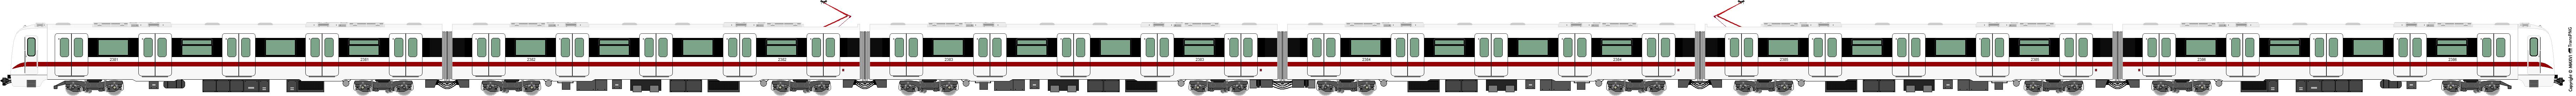 [5330] Shenzhen Metro 5330